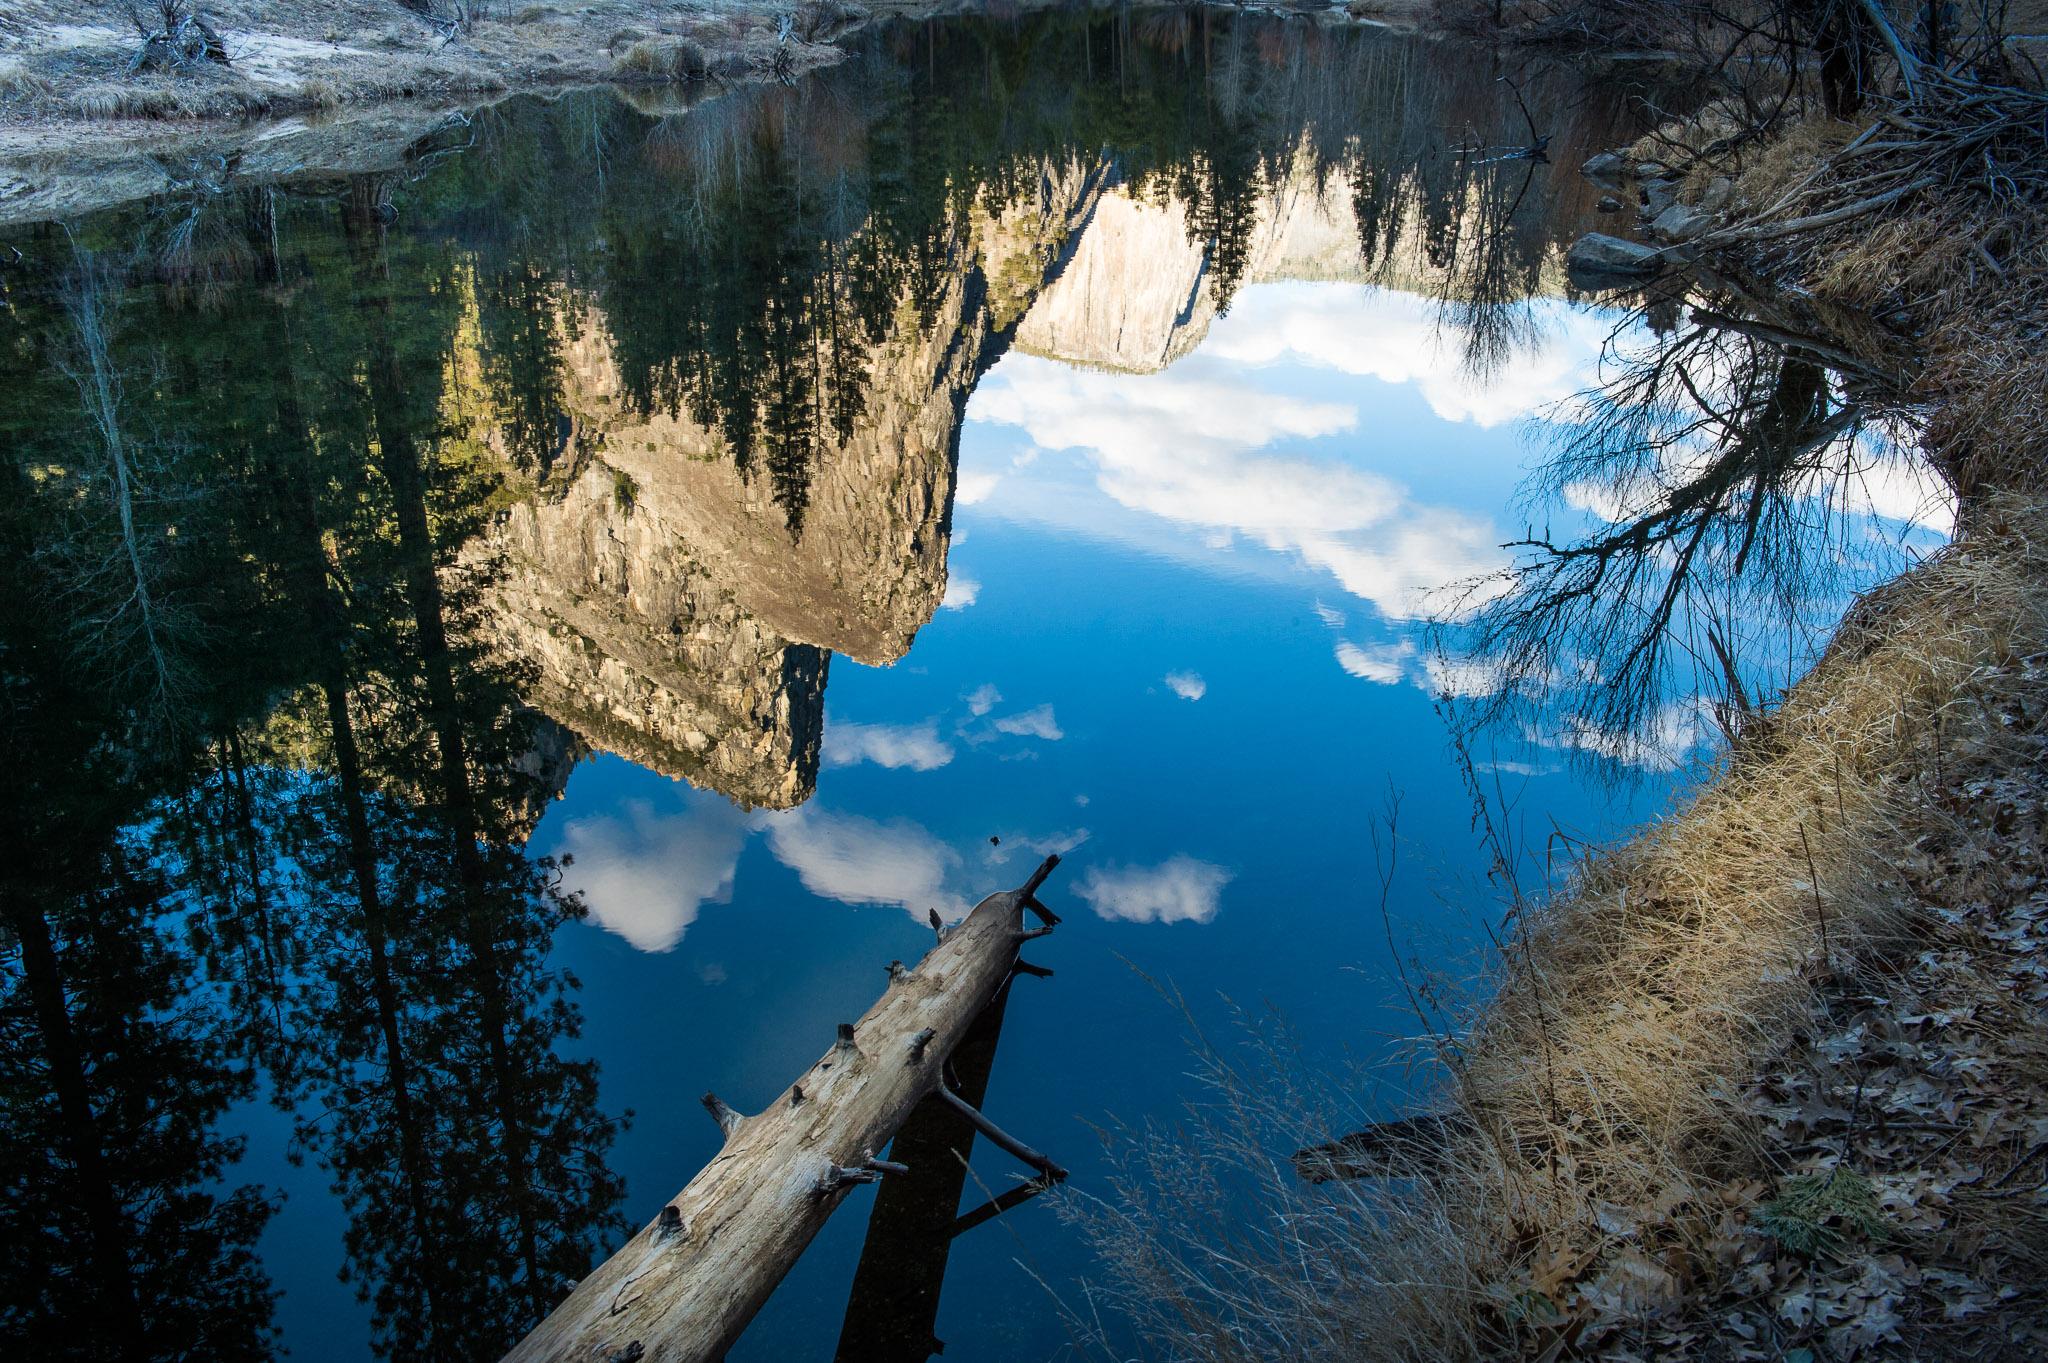 Jason-Davis-Images-Yosemite-0039.jpg